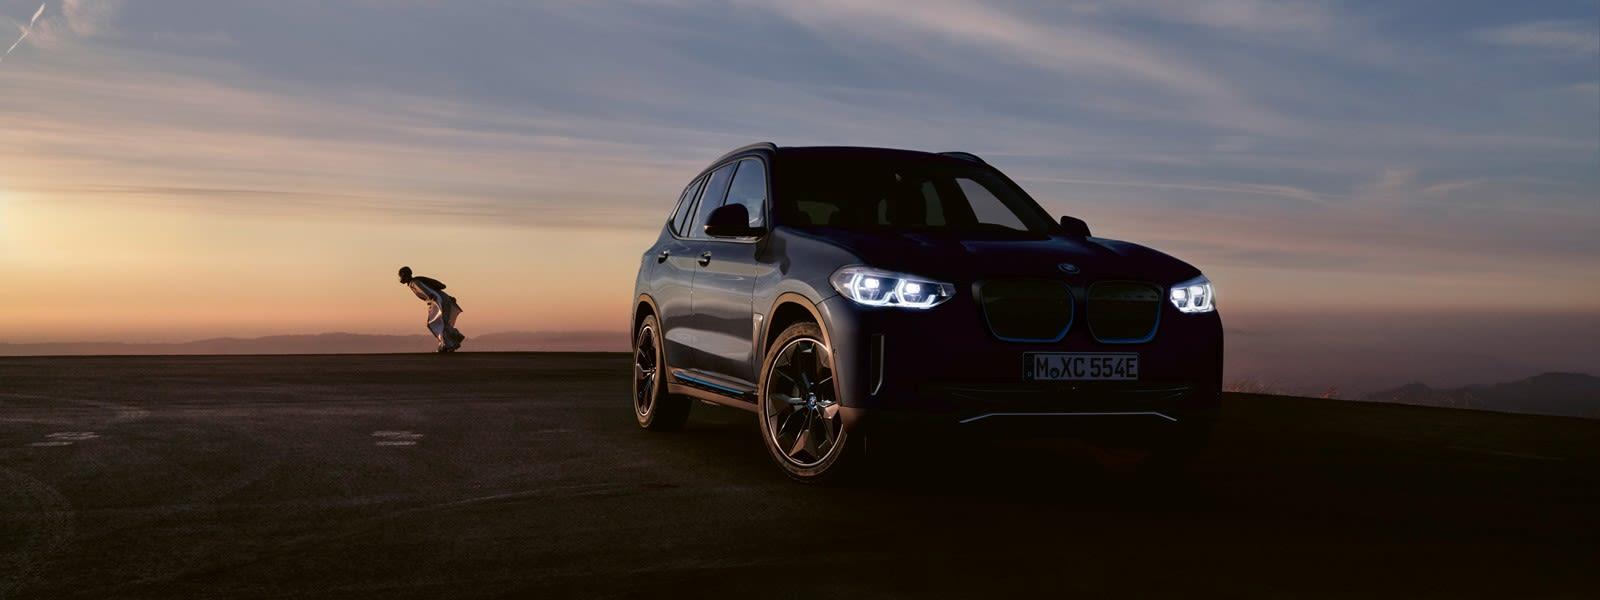 BMW Park Lane   Authorised BMW Retailer